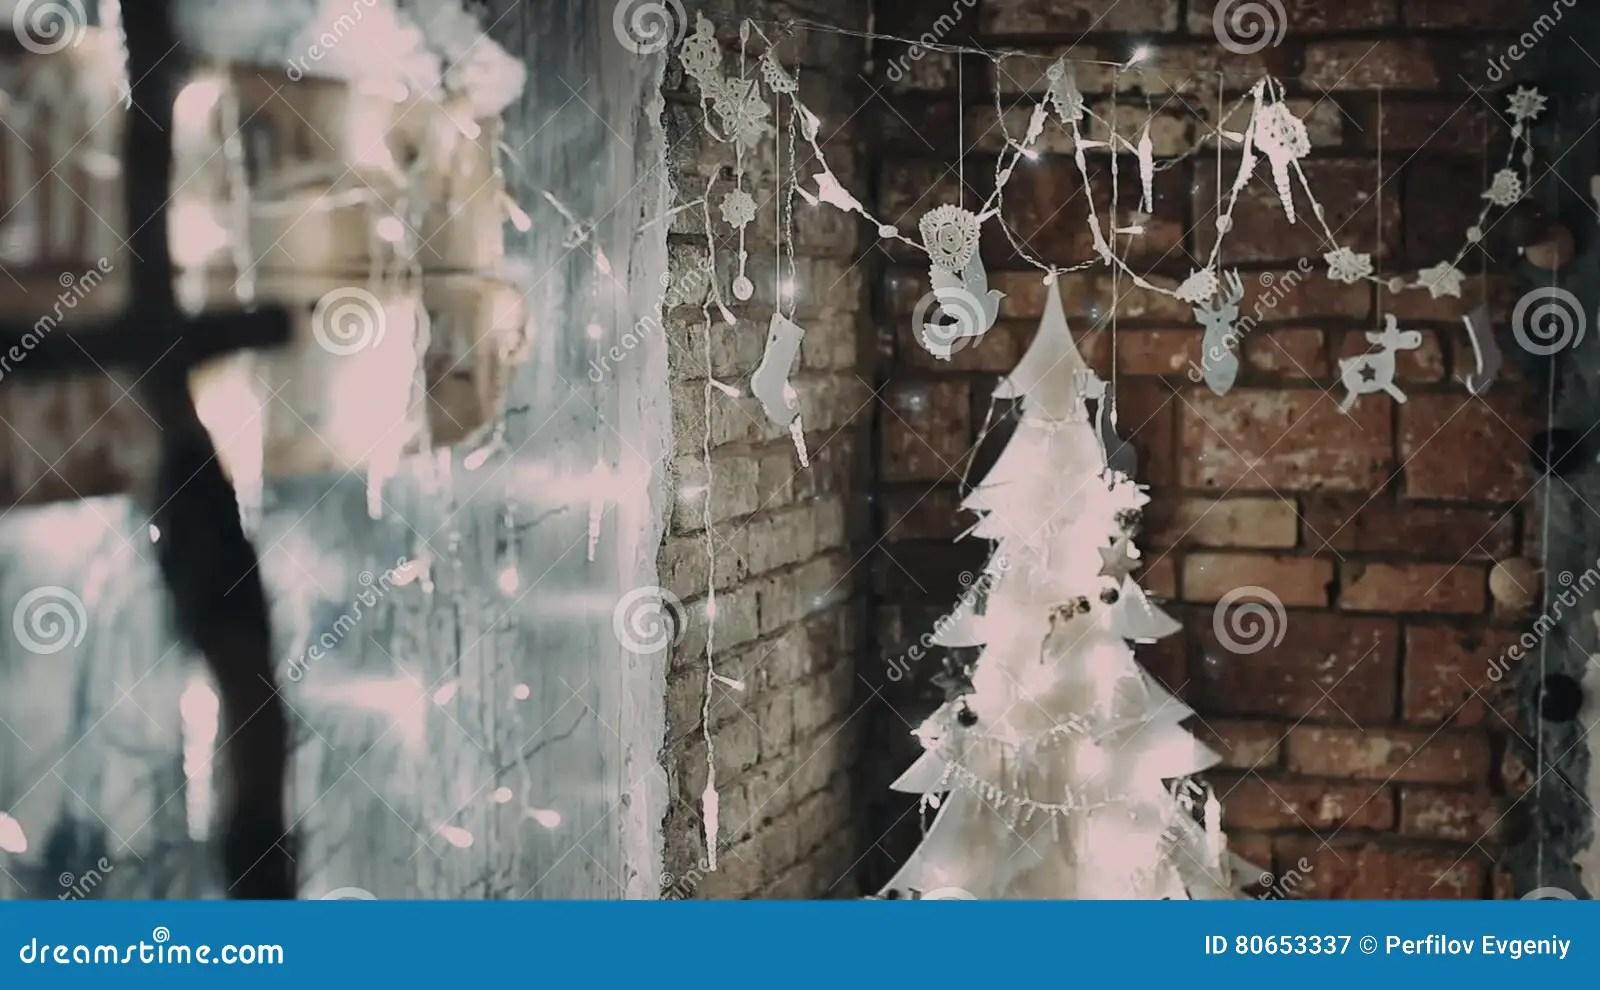 farmhouse kitchen faucet stainless steel islands 浆果装饰霍莉家留给槲寄生多雪的结构树白色冬天圣诞节土气内部农舍装饰 浆果装饰霍莉家留给槲寄生多雪的结构树白色冬天圣诞节土气内部农舍装饰股票视频 视频包括有browne 装饰 80653337